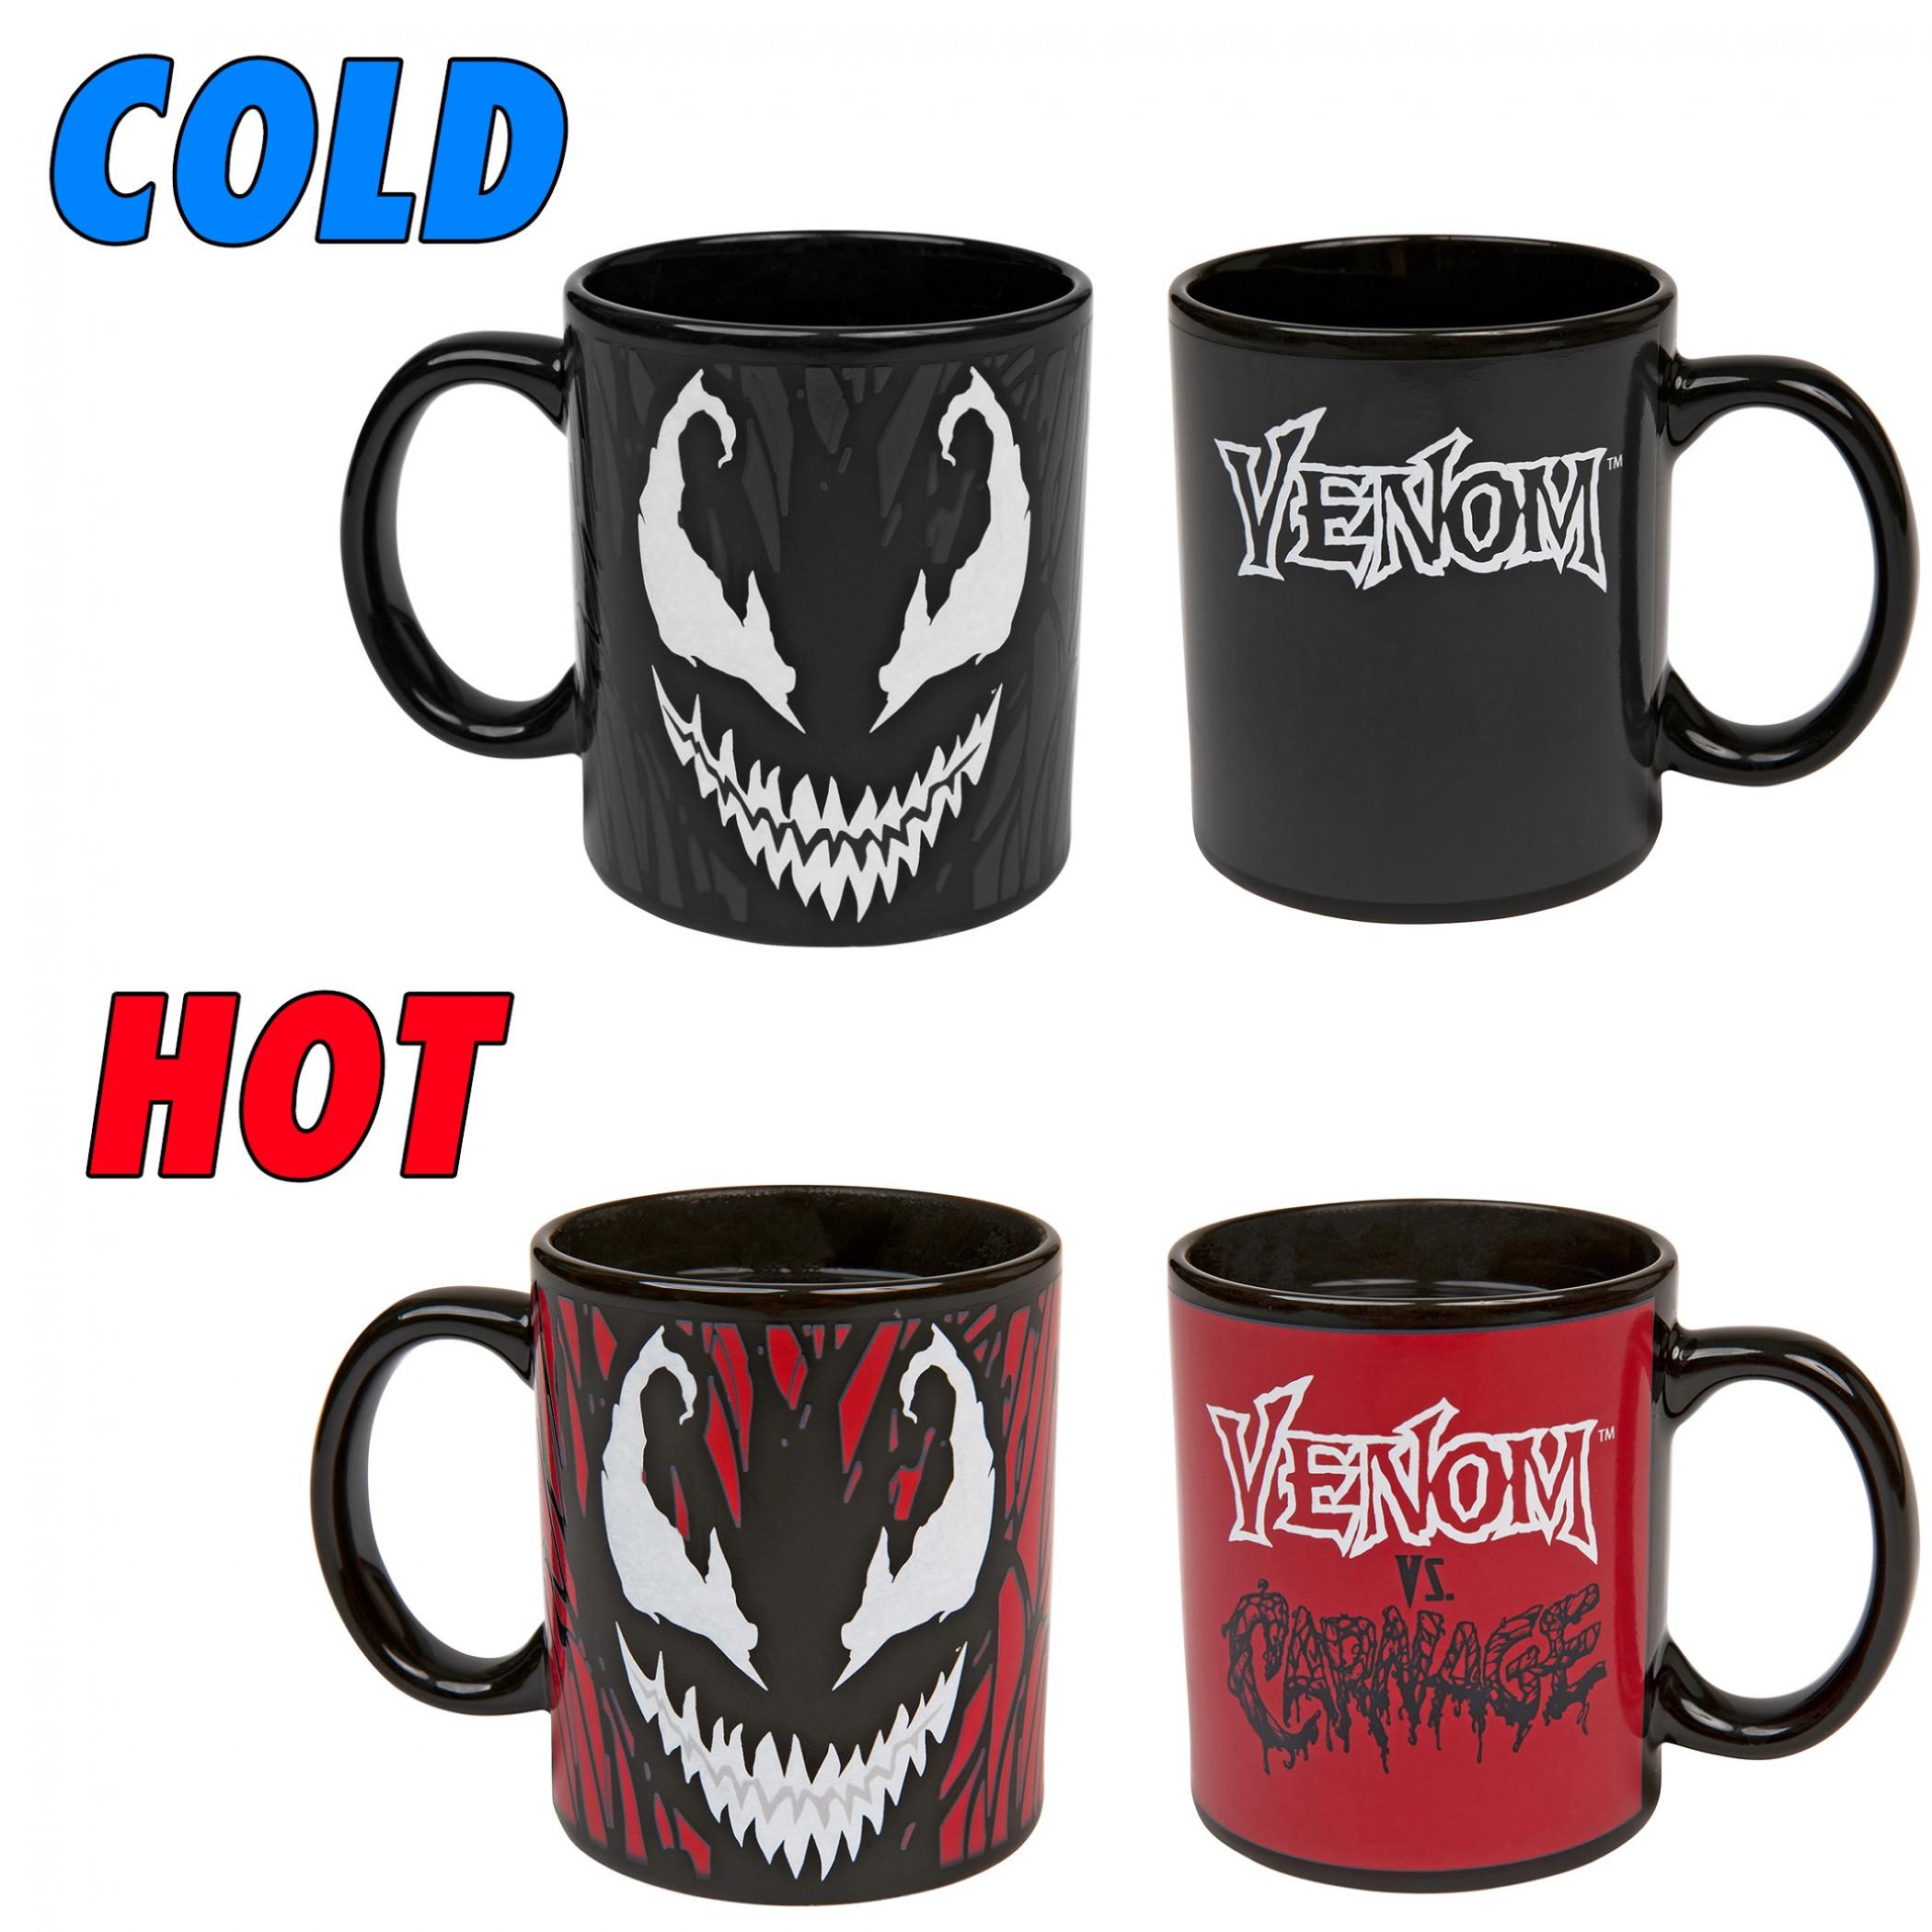 Venom vs. Carnage Color Changing 11 Ounce Mug